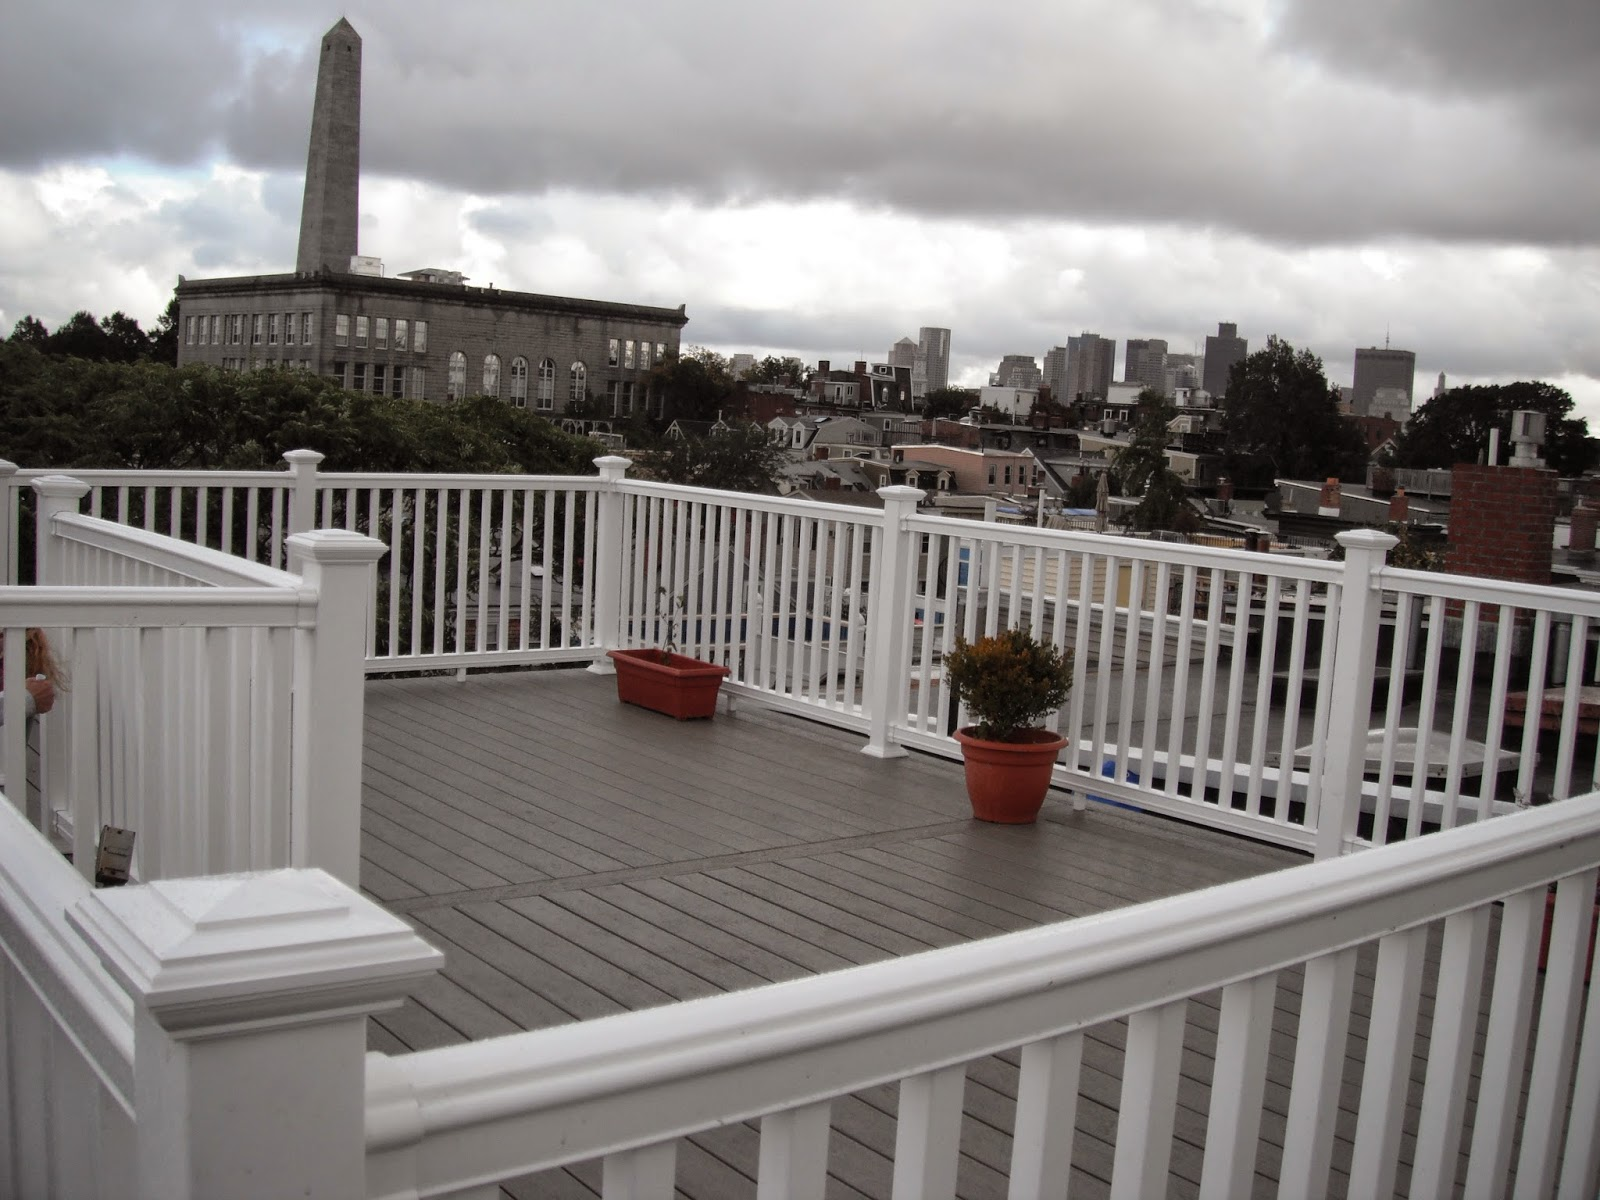 Maintenance Free Decking-Composite Decking-Railing-Deck Repair ... on